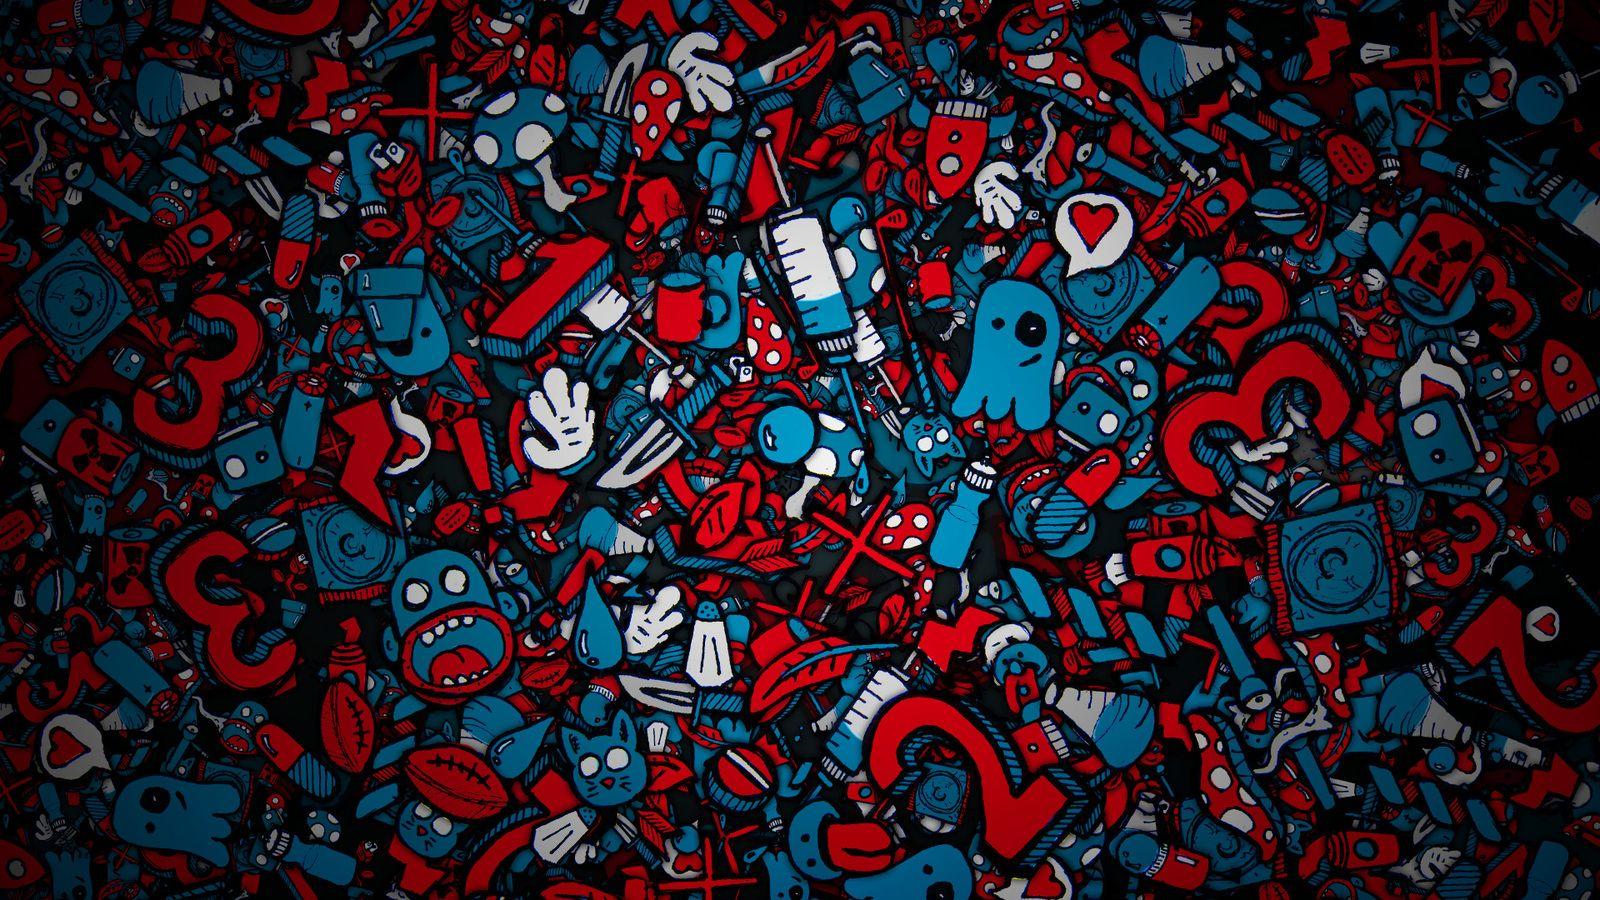 cool wallpapers hd 8087 | #ARTE in 2019 | Imac wallpaper, Number wallpaper, Hd cool wallpapers